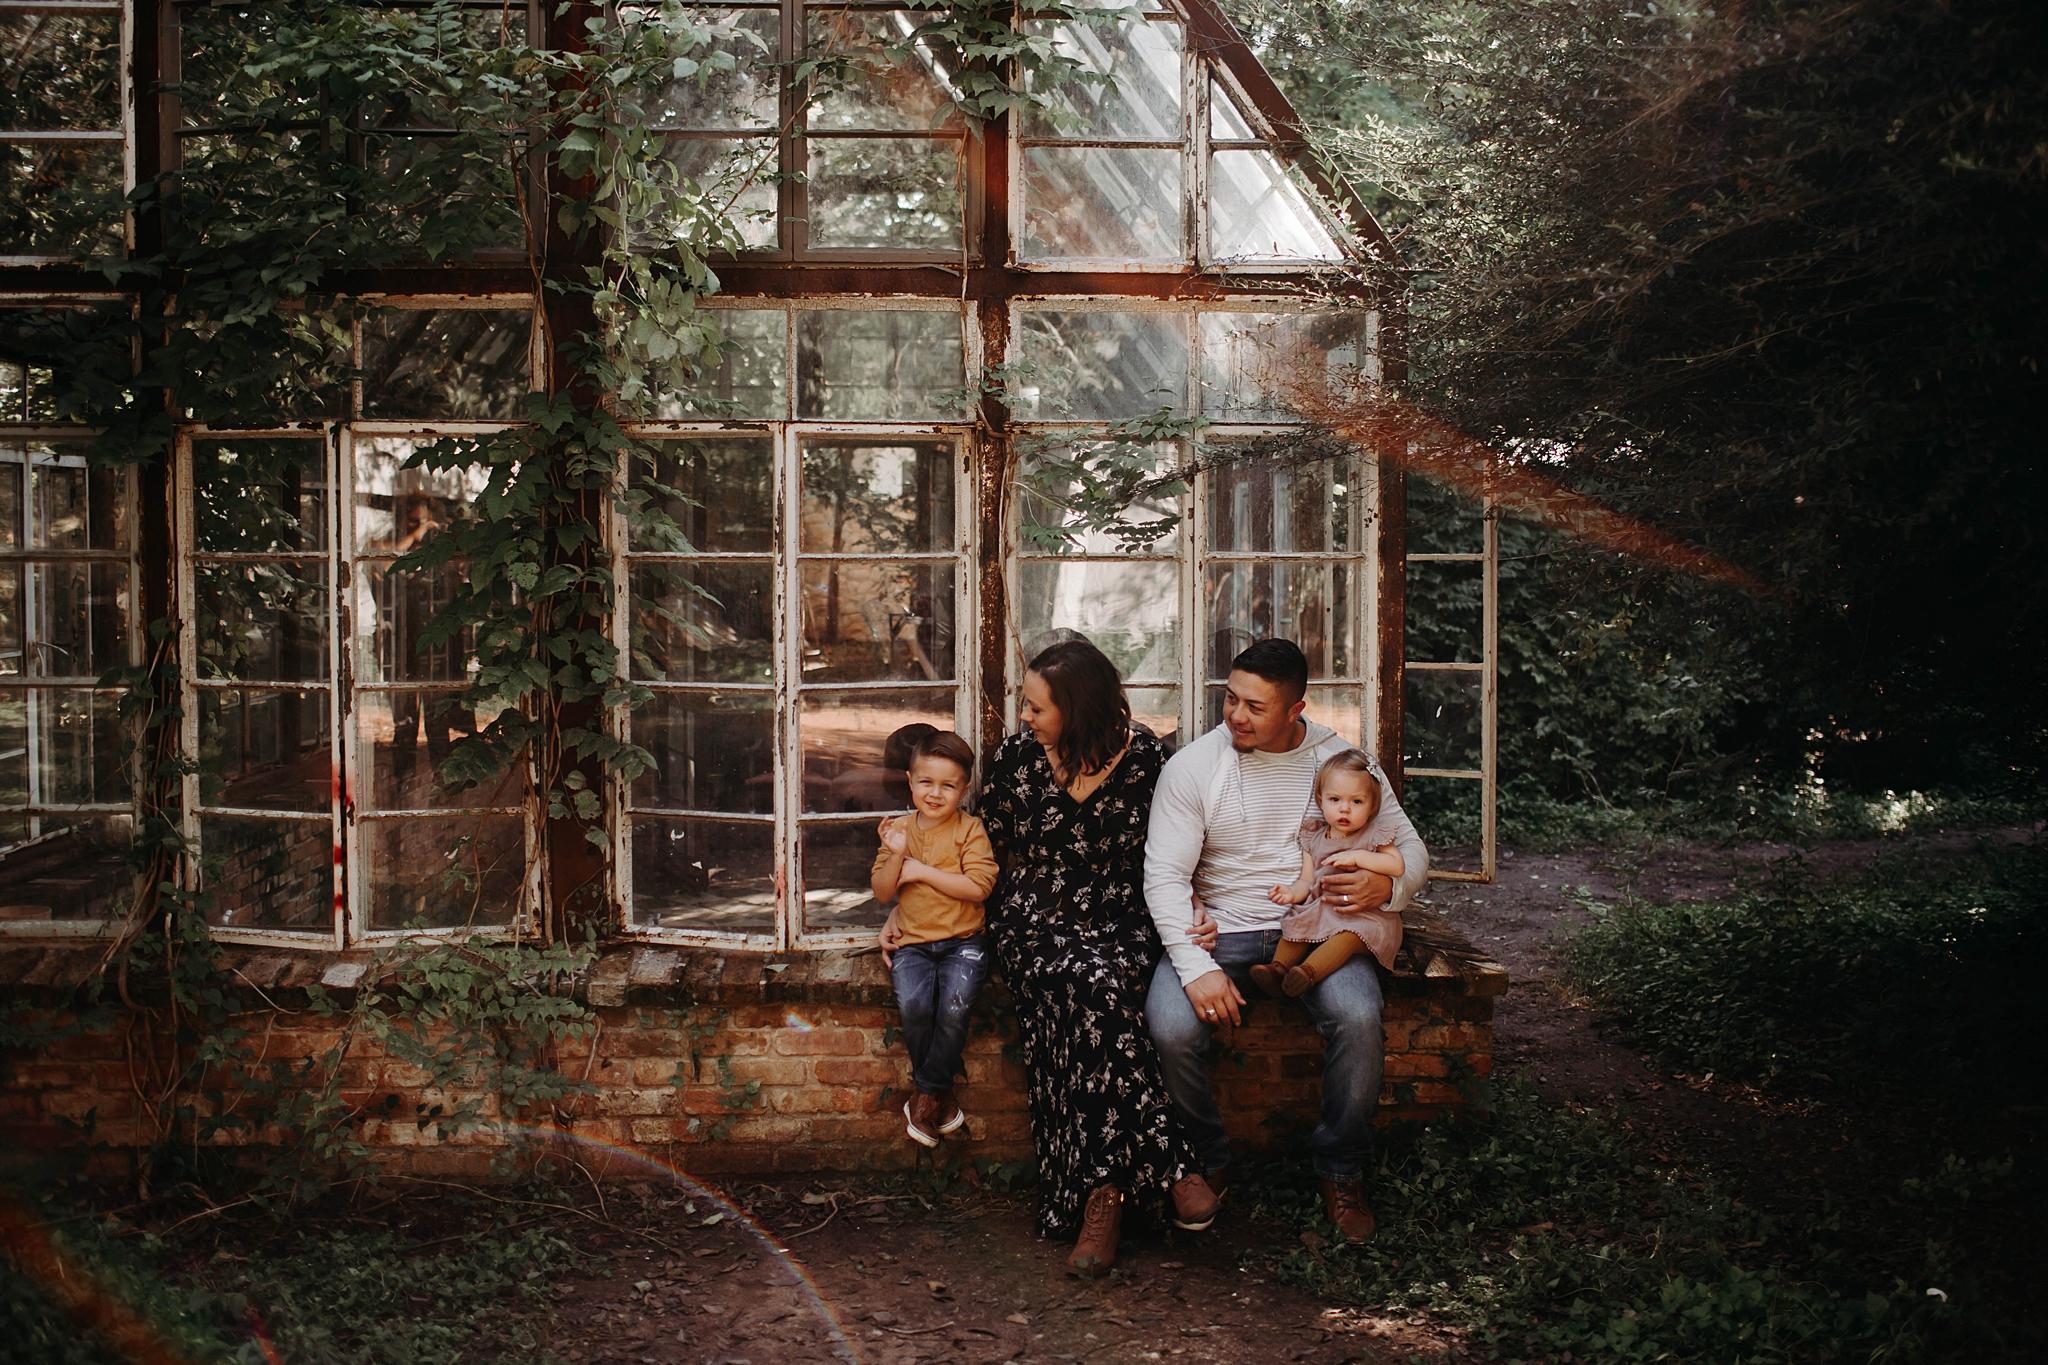 Luera-VMP-San-Antonio-Family-Photography-1_WEB.jpg